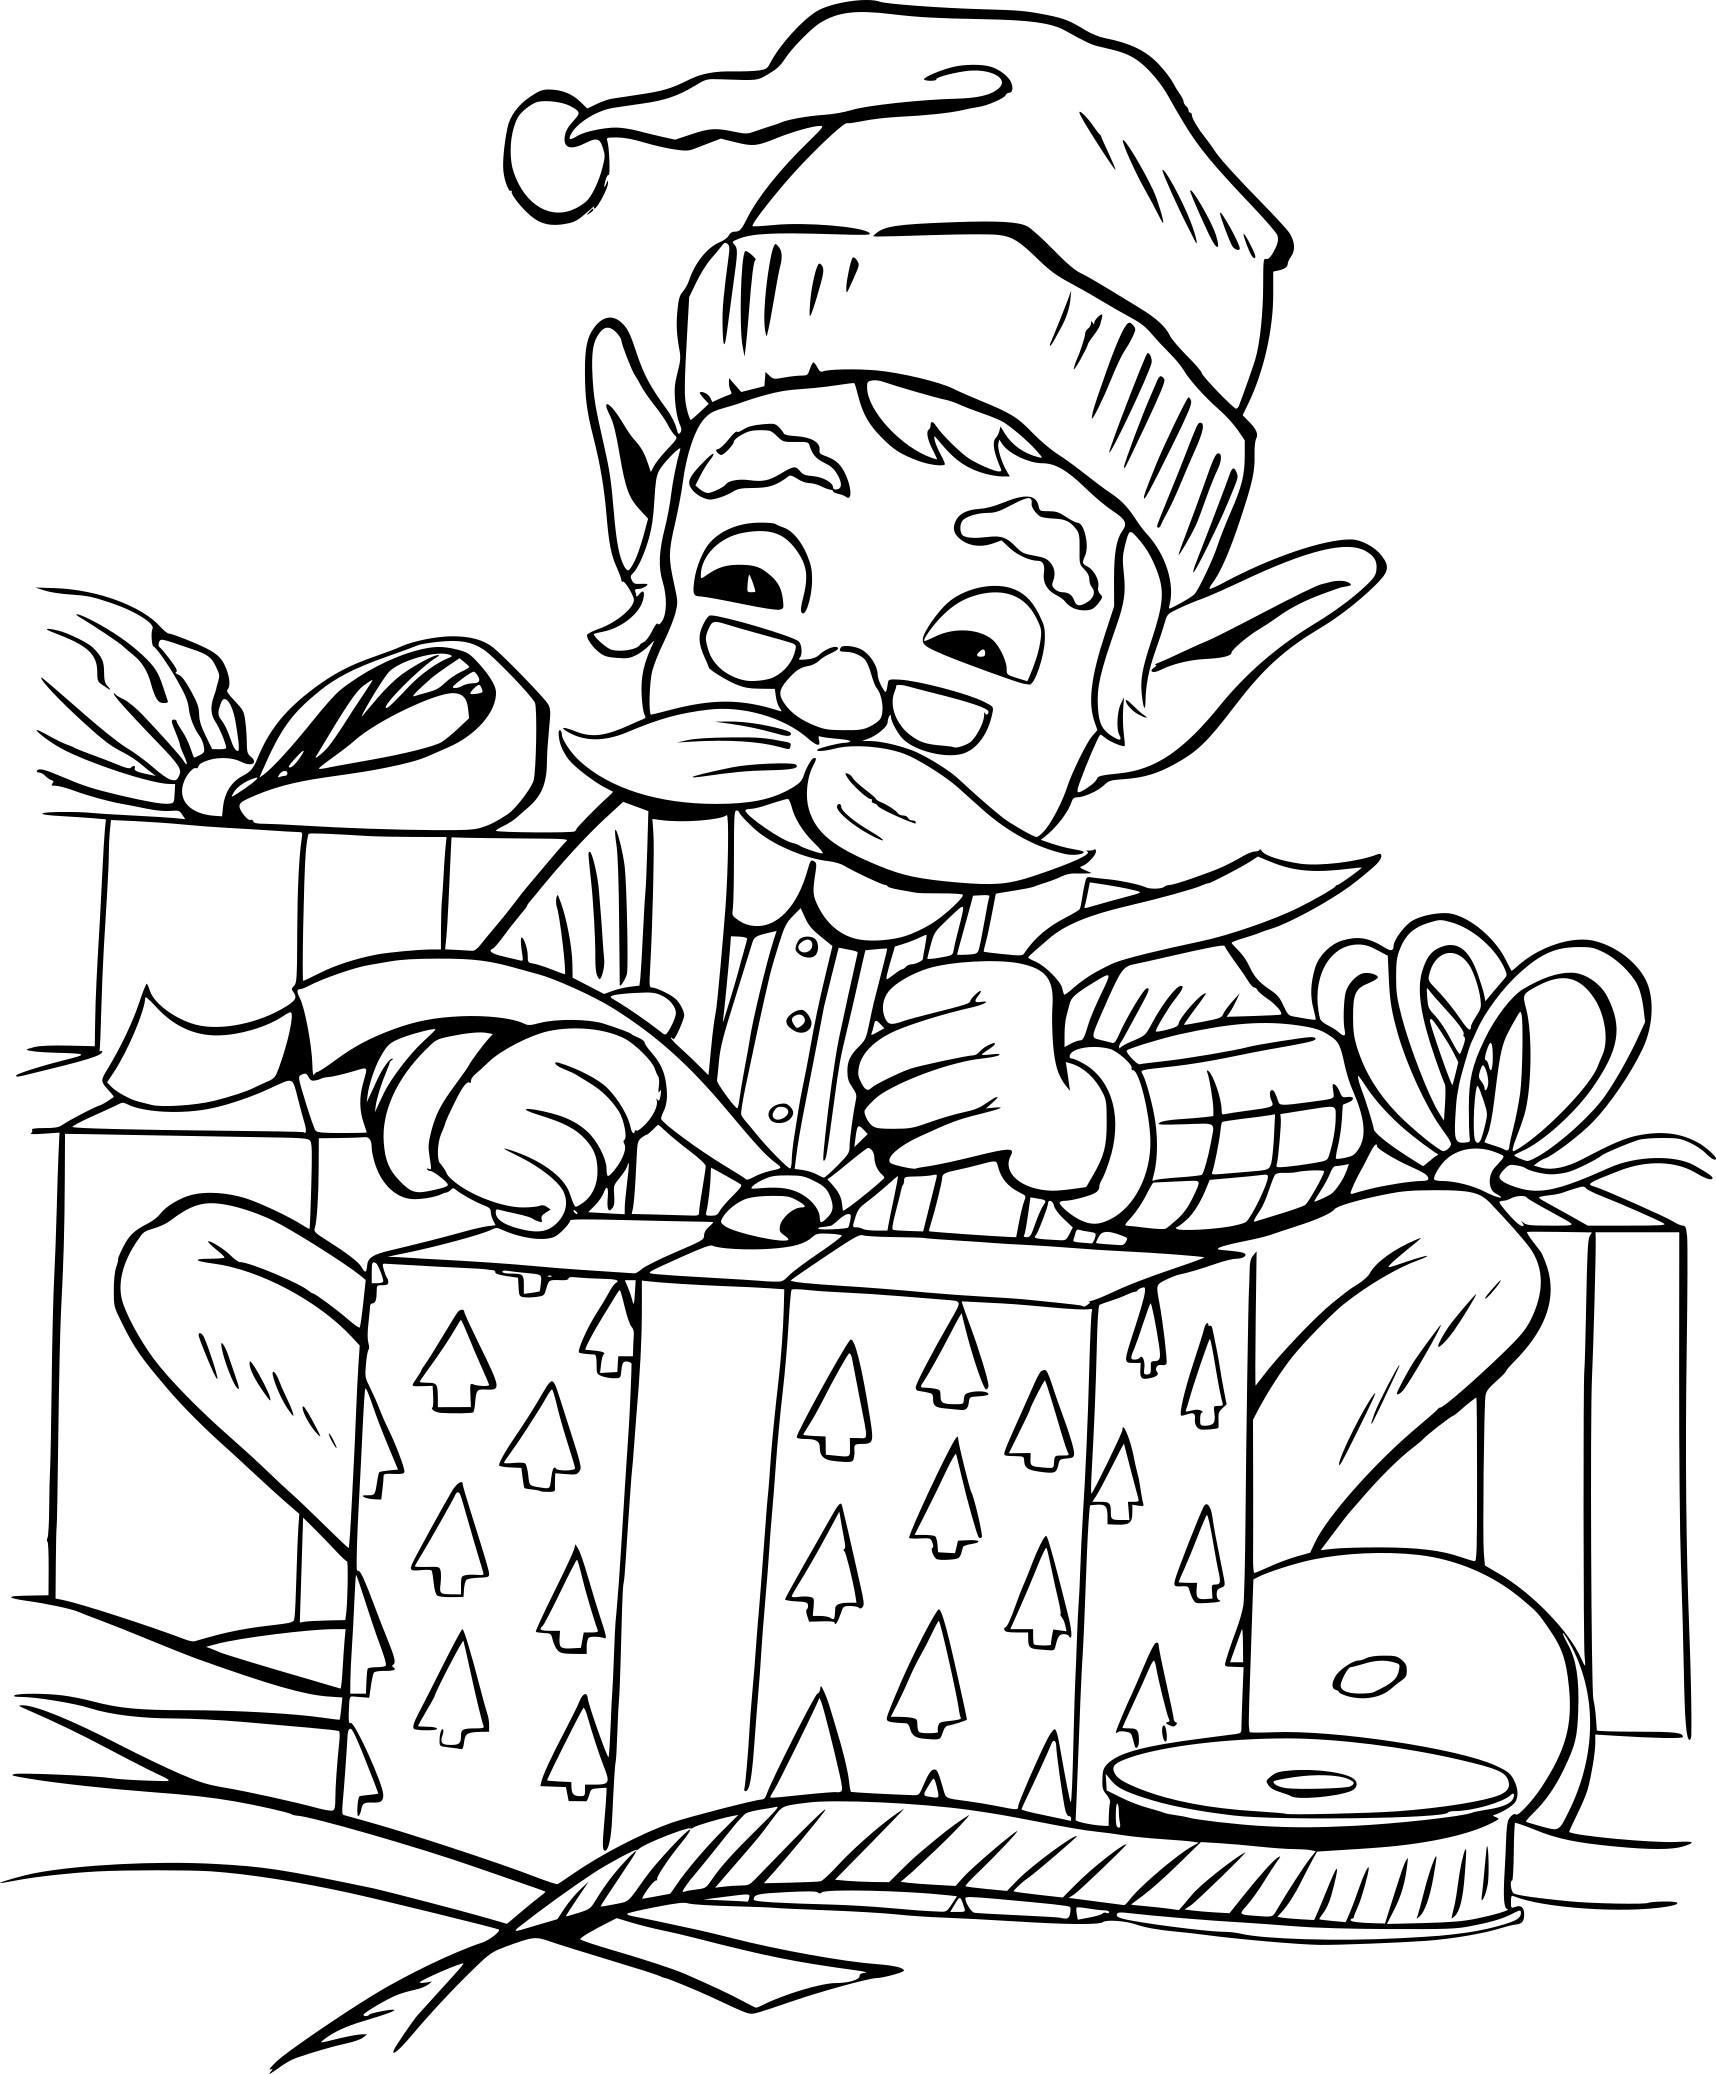 Coloriage Lutin De Noel À Imprimer serapportantà Dessiner Un Lutin